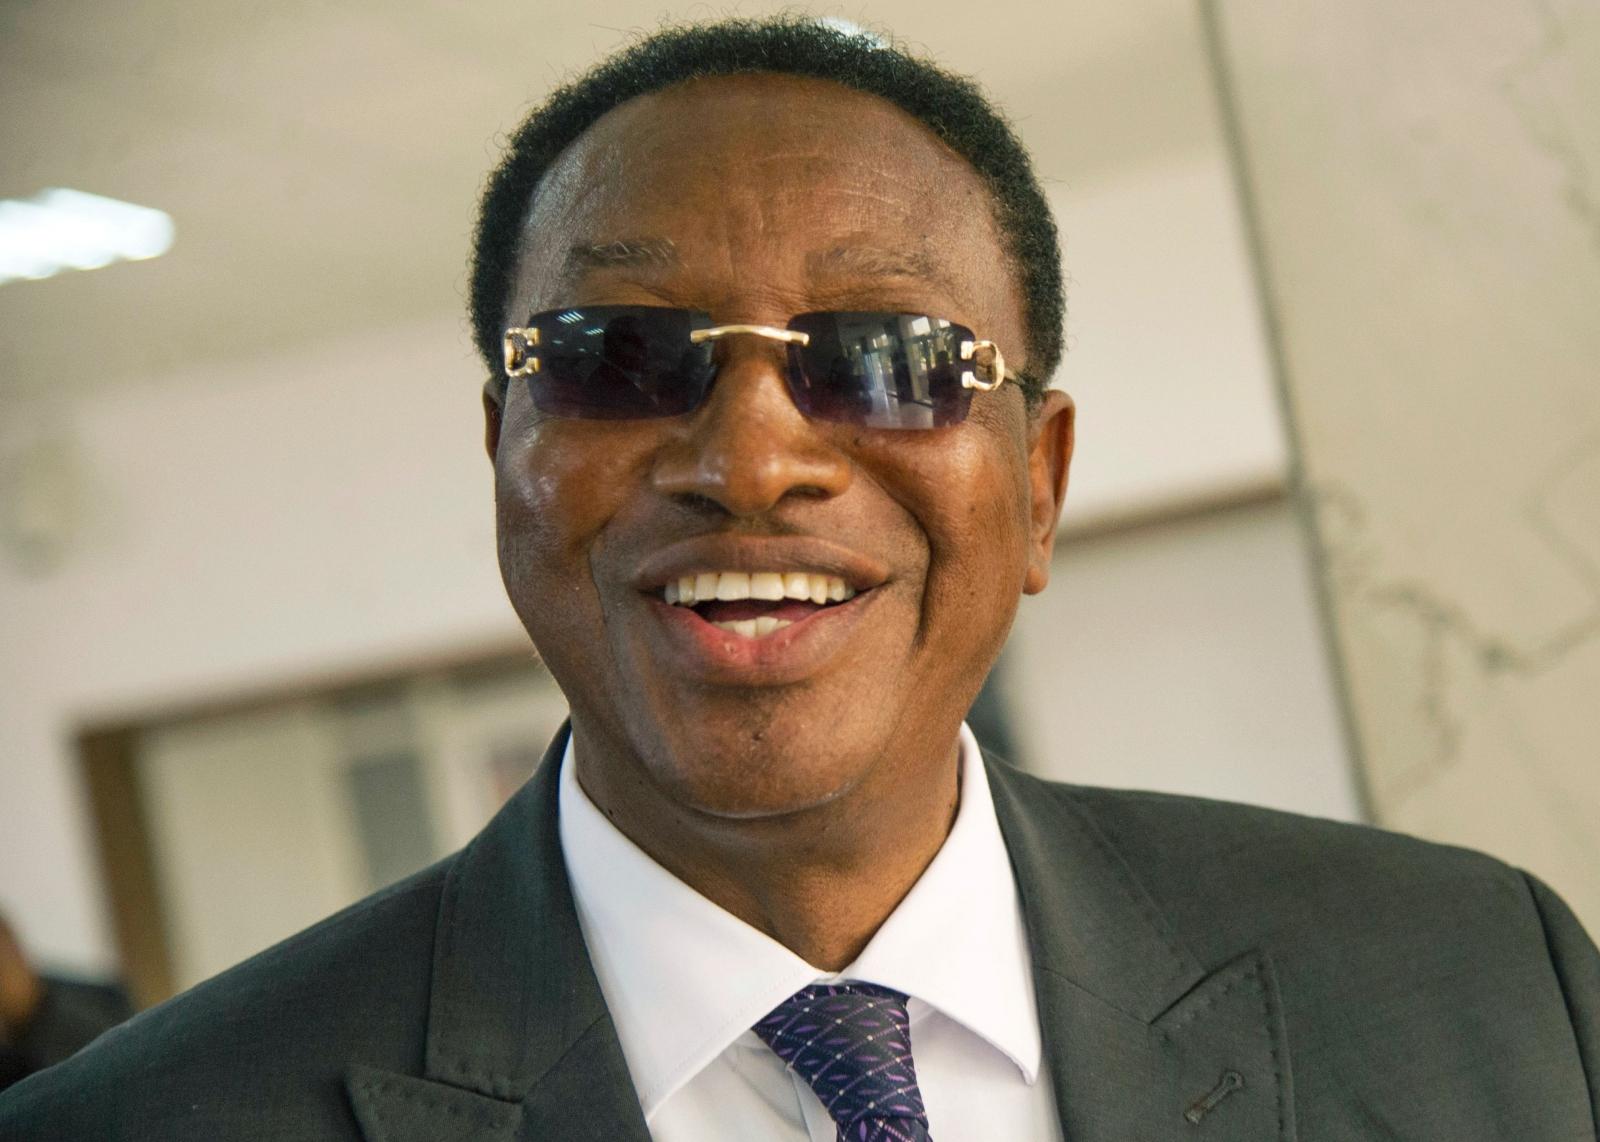 Prime Minister Bruno Tshibala